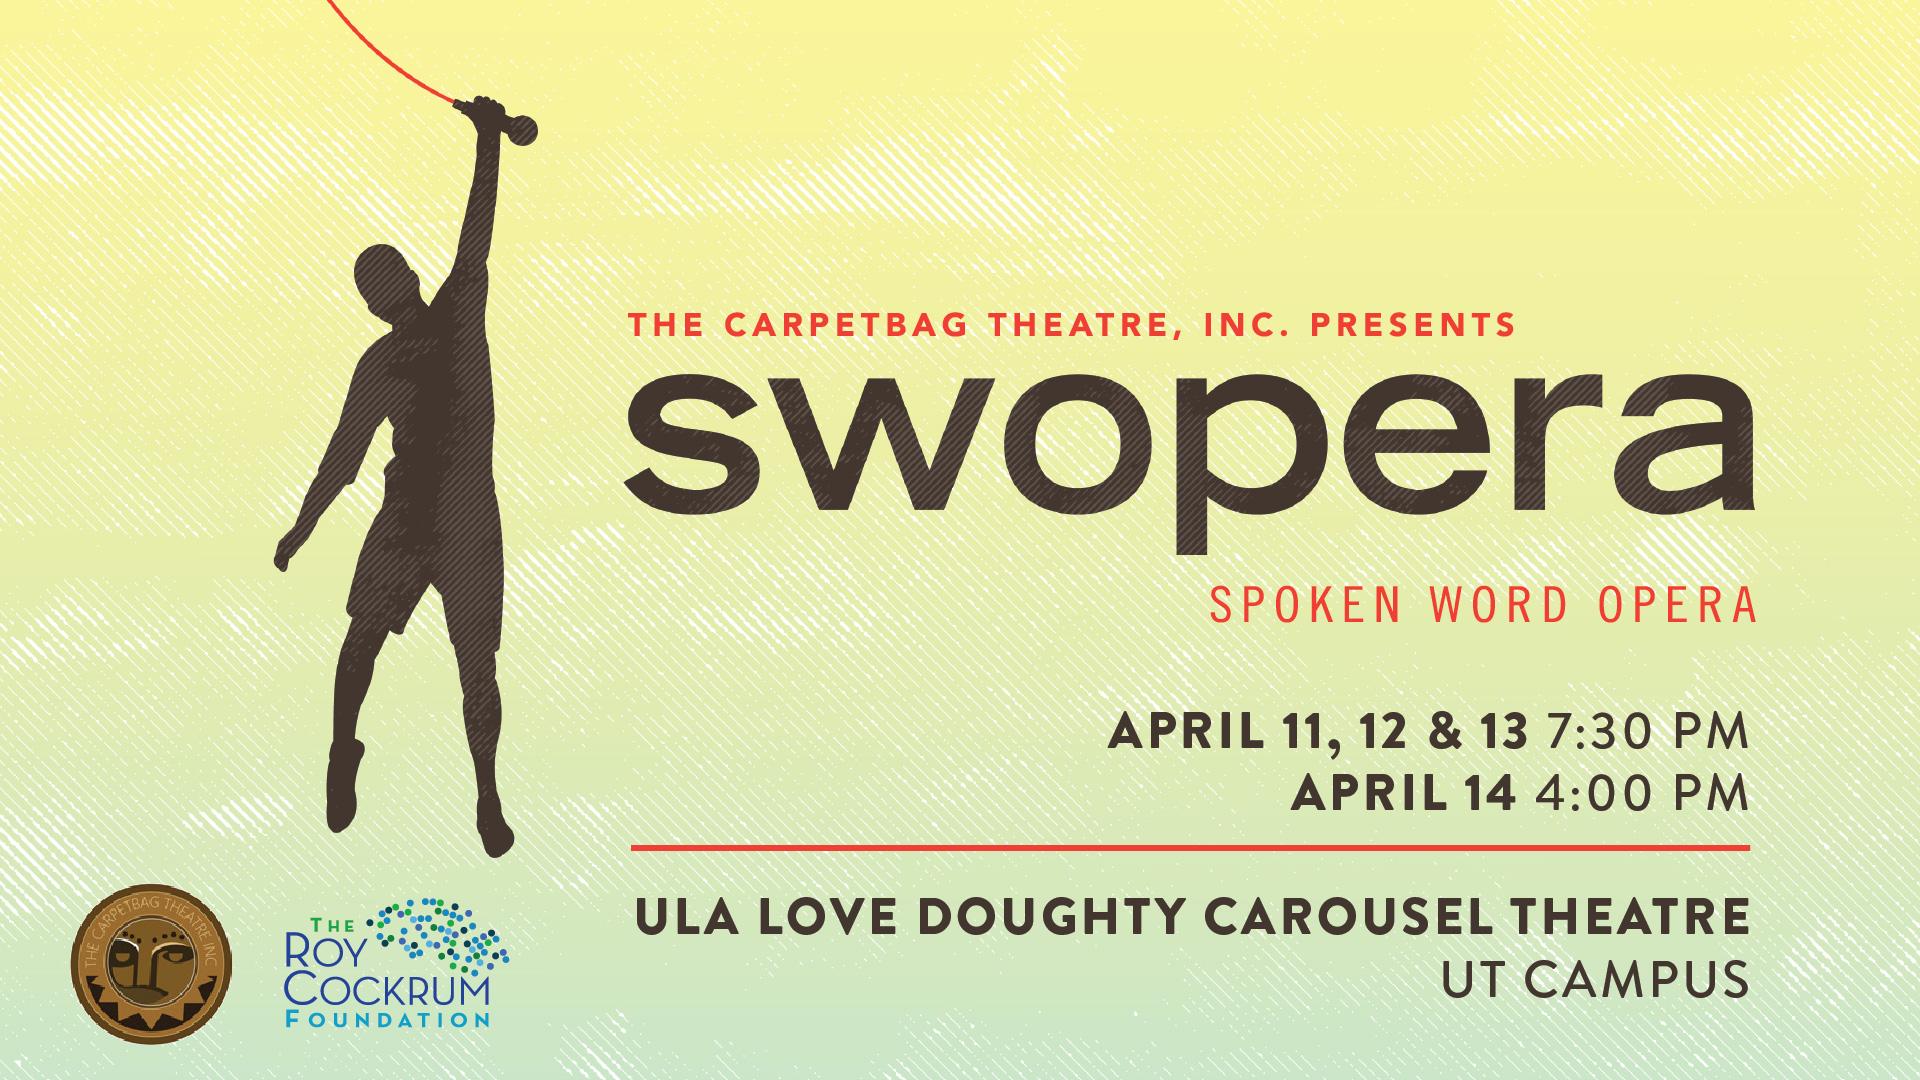 Our next production SWOPERA: A Spoken Word Opera — The Carpetbag Theatre